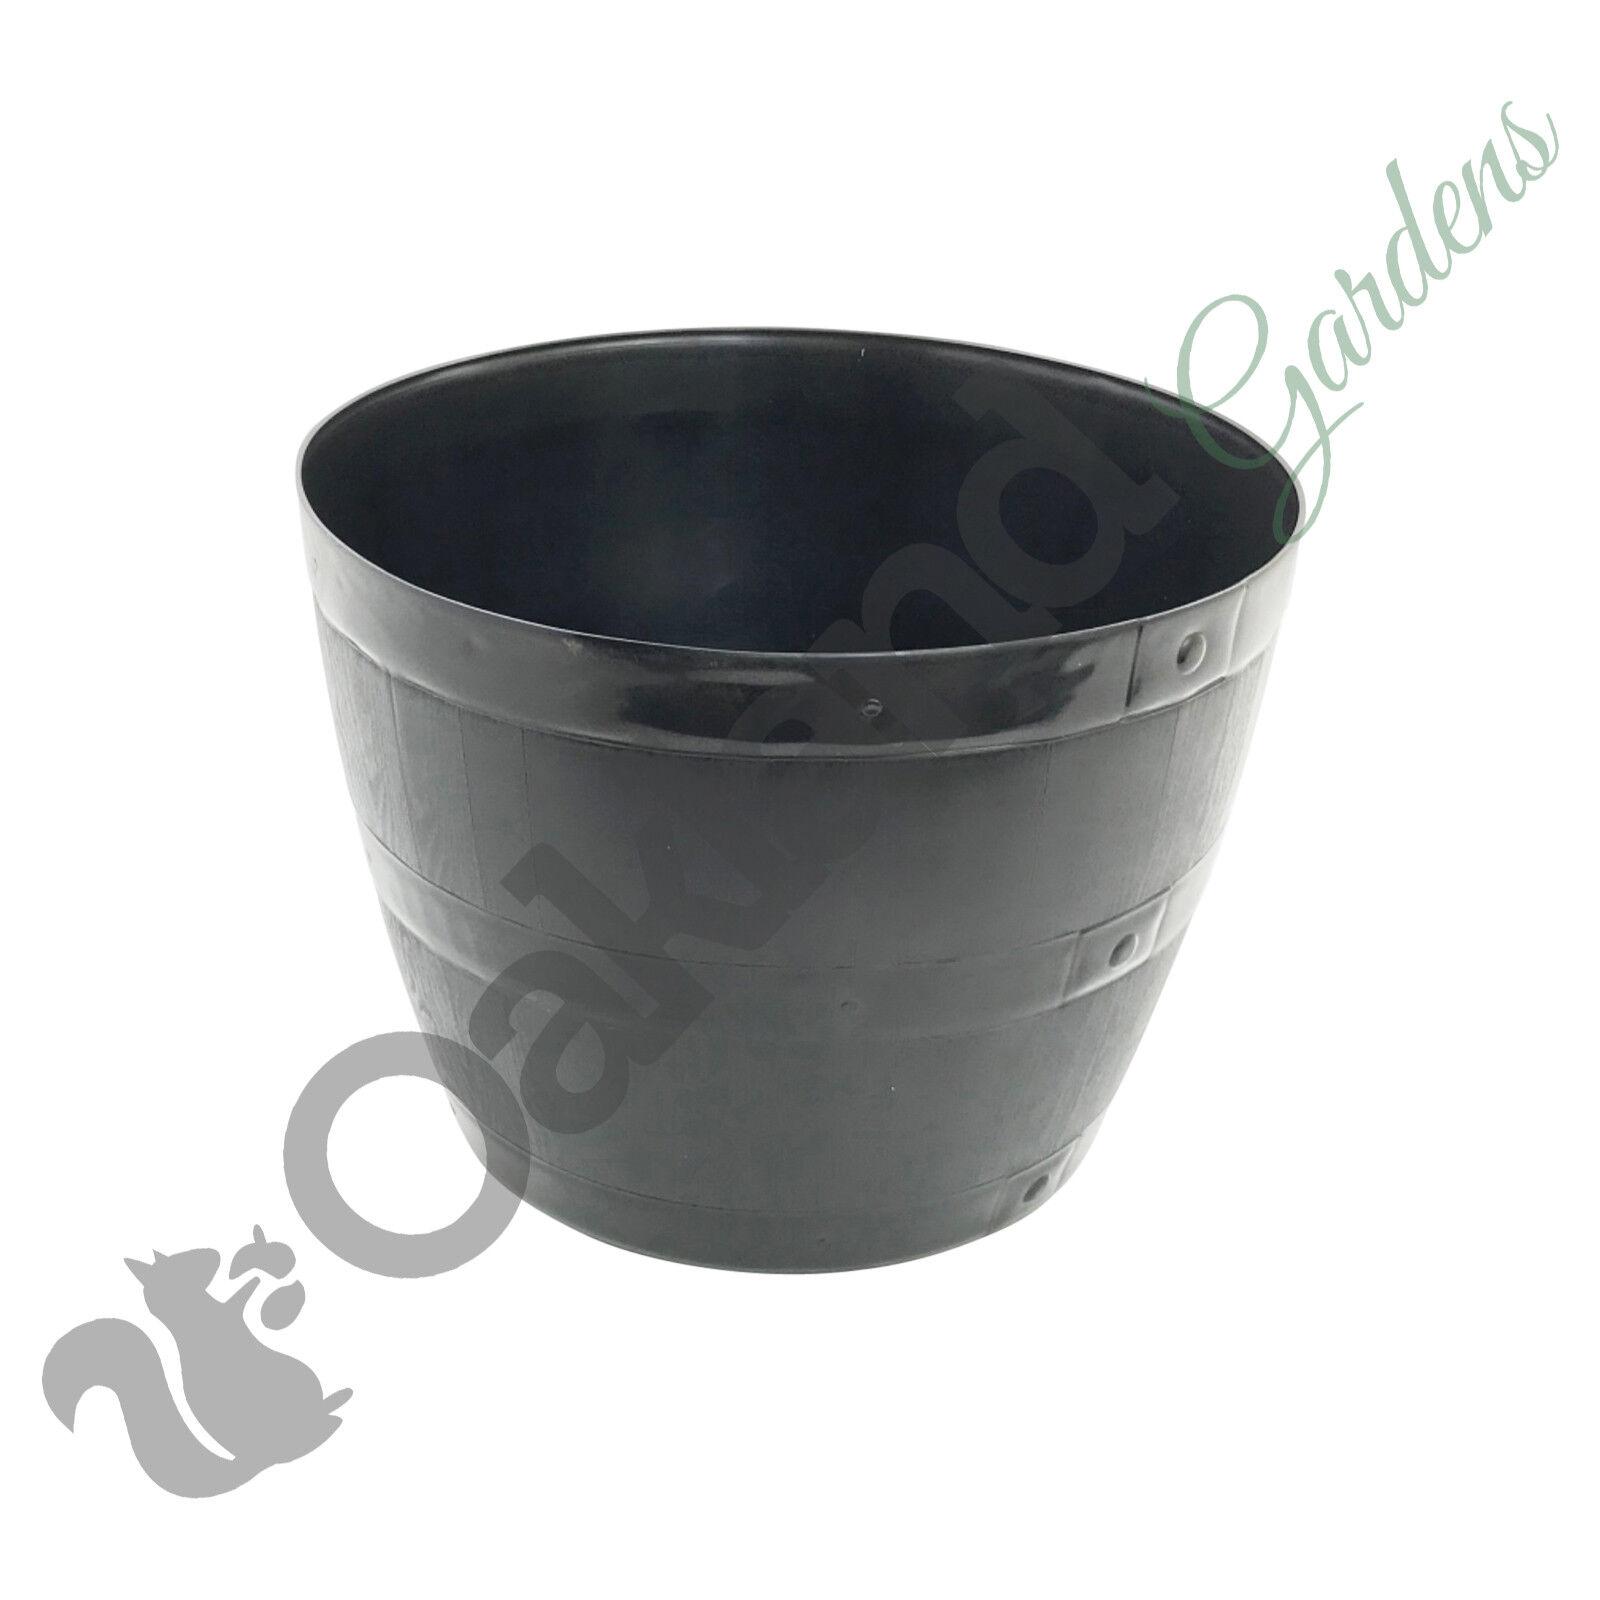 Barrel Style Planters